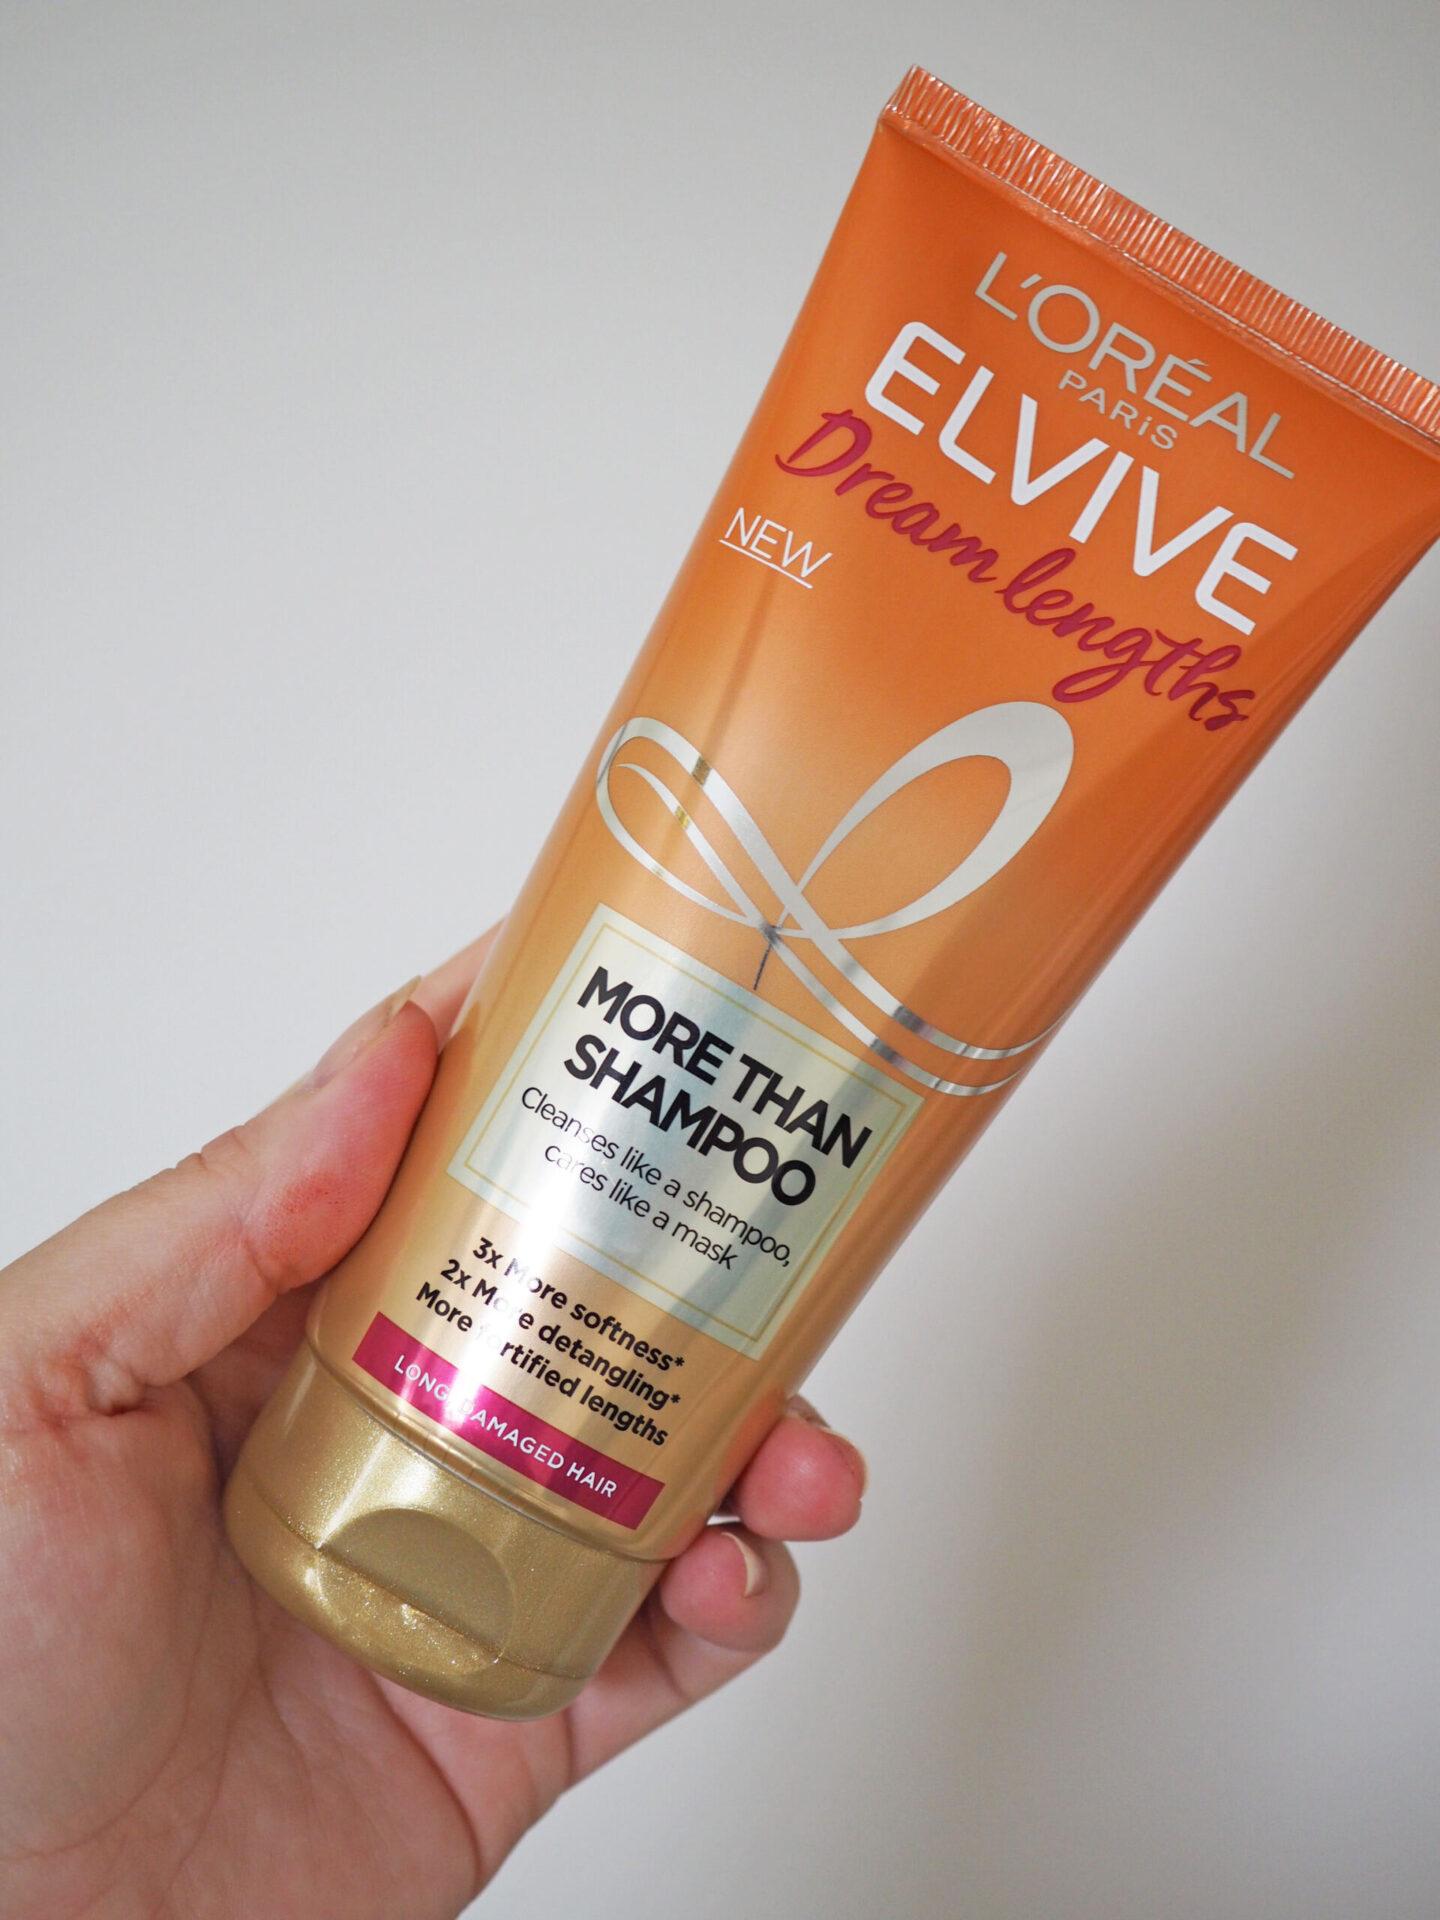 l'oreal elvive dream lengths more than shampoo review